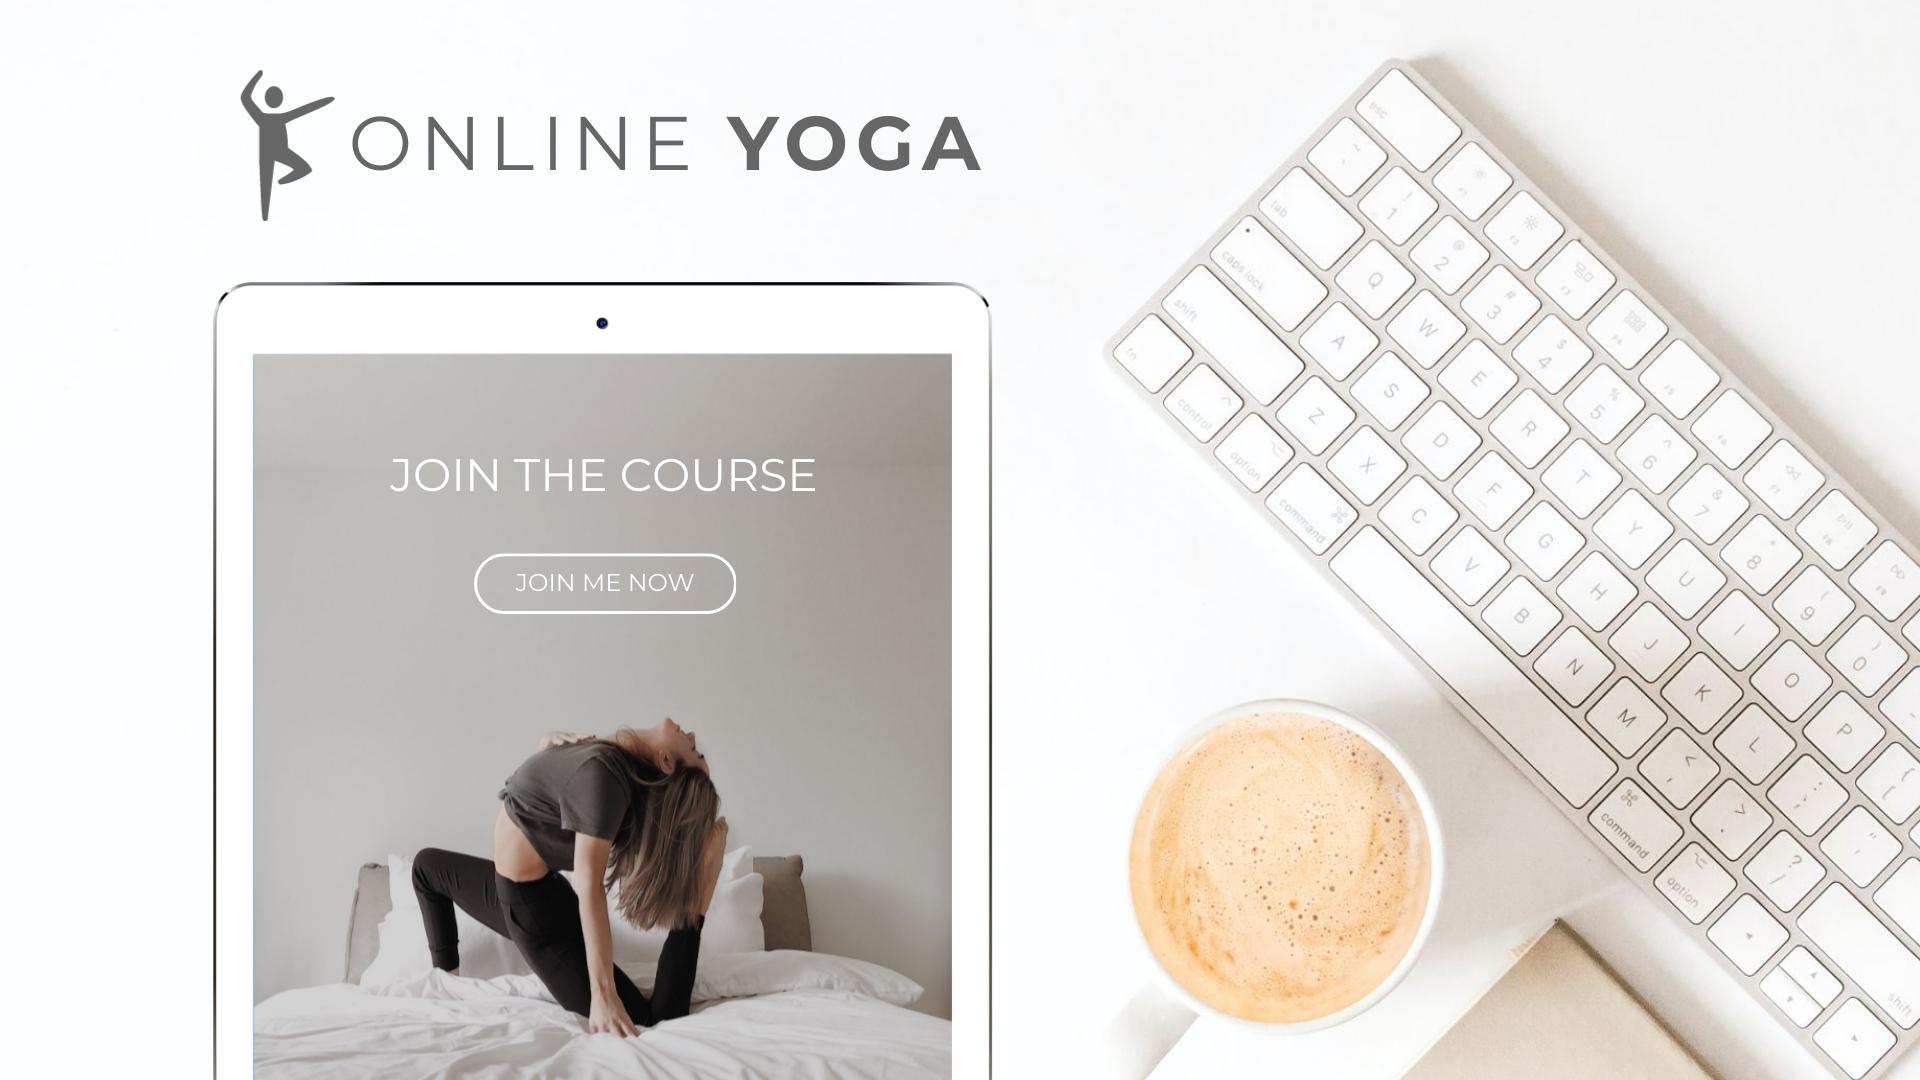 Yoga Course Mockup Wide Template